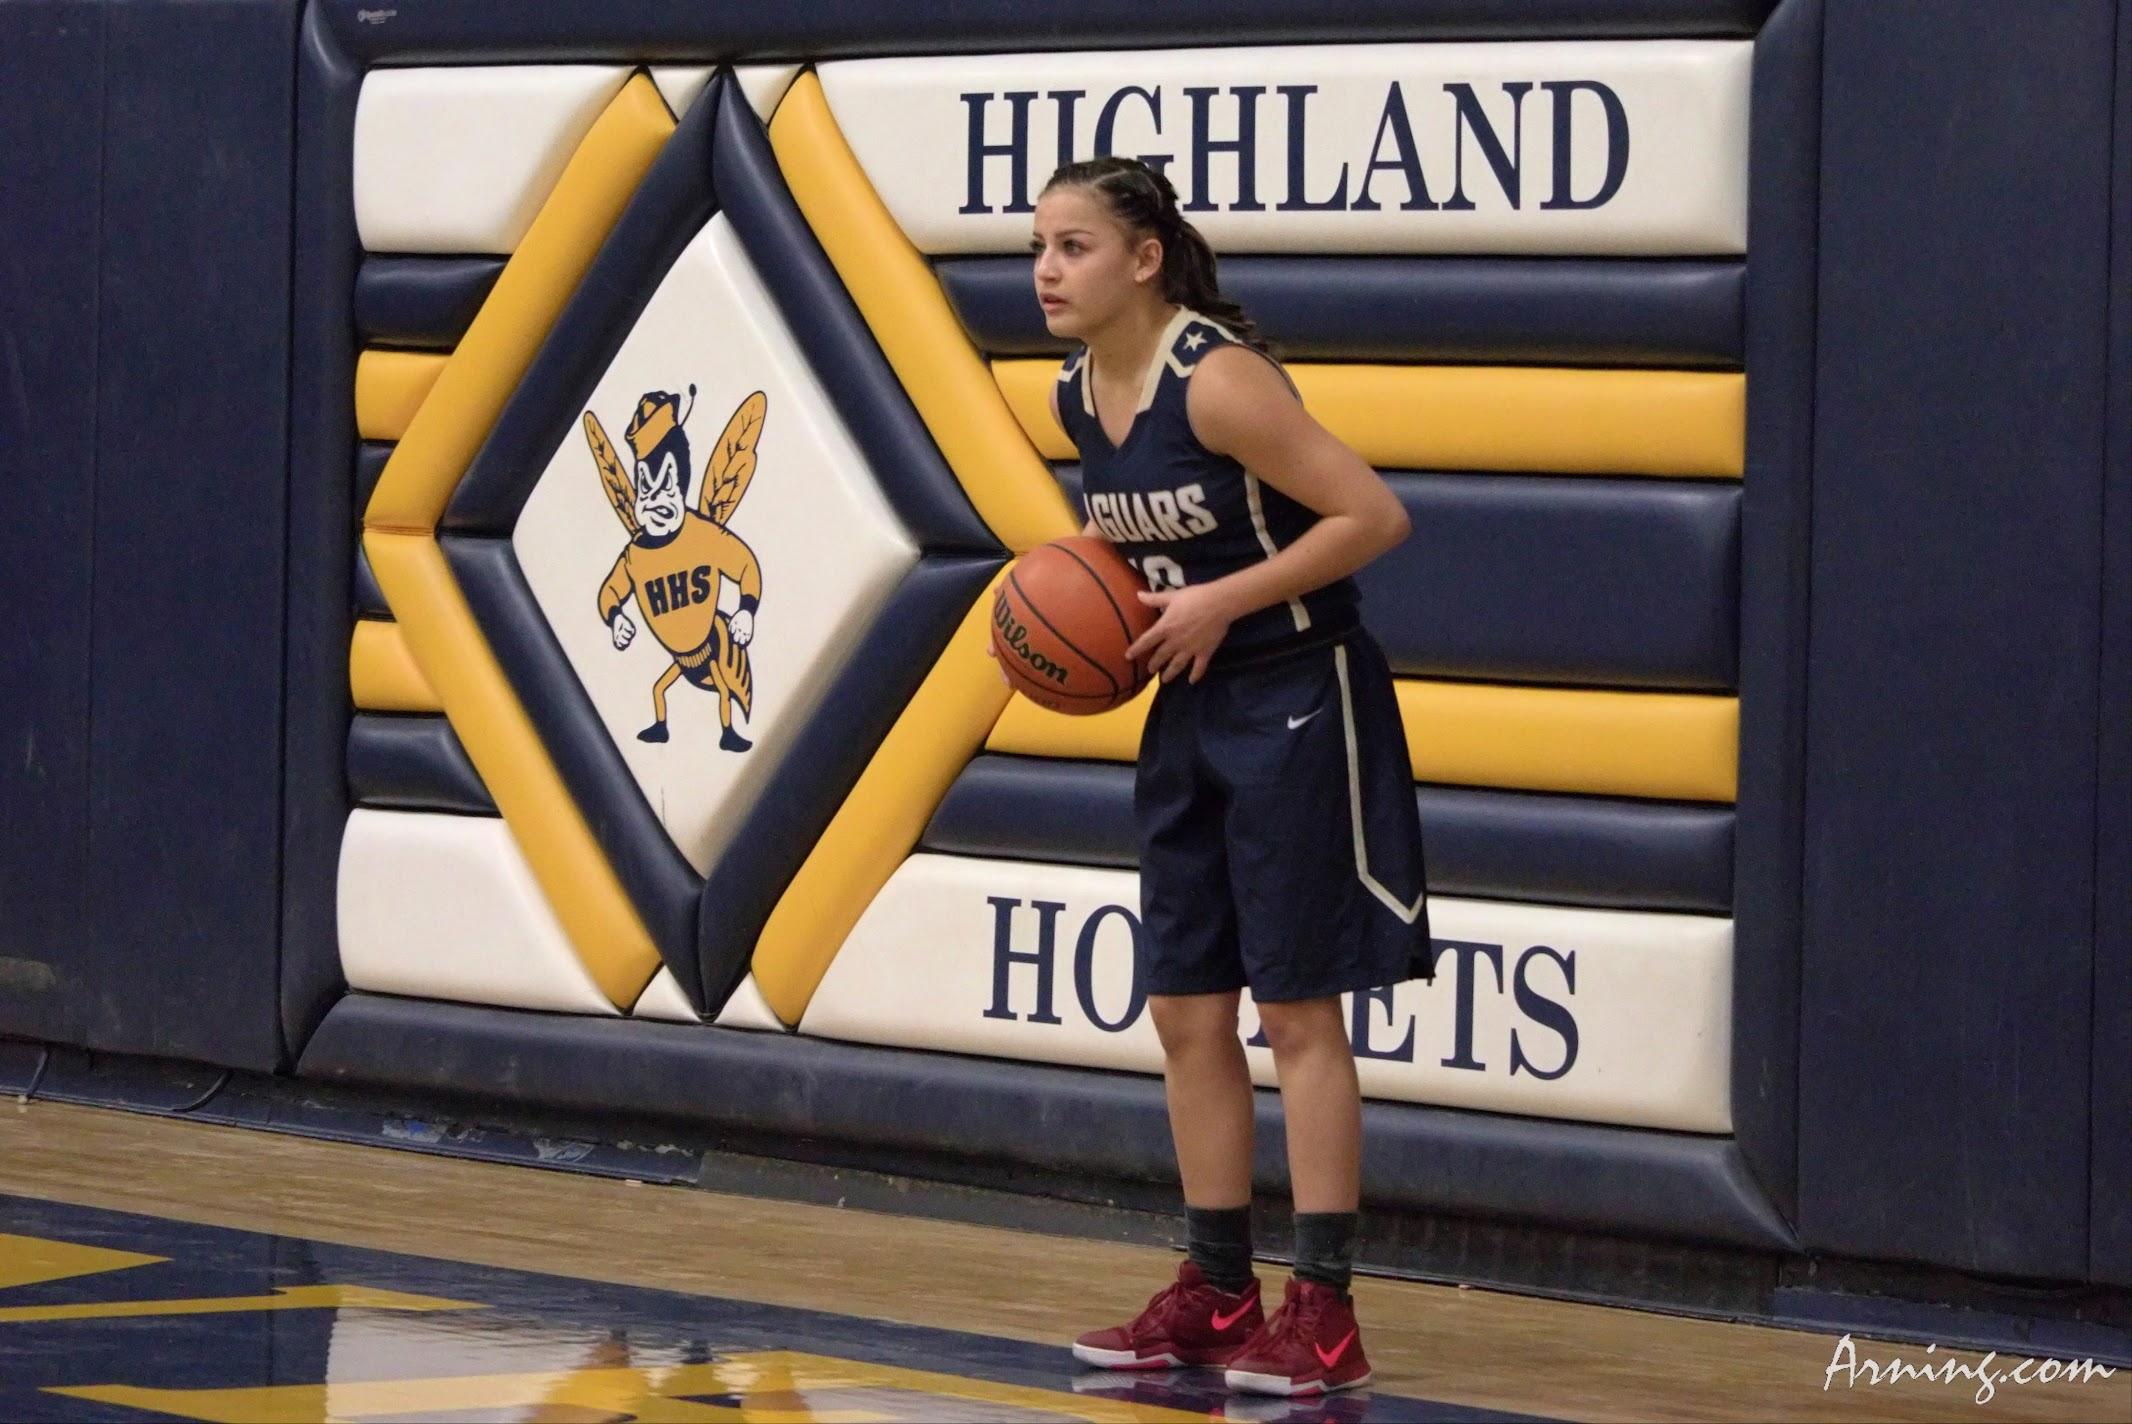 Highland High School Basketball Game